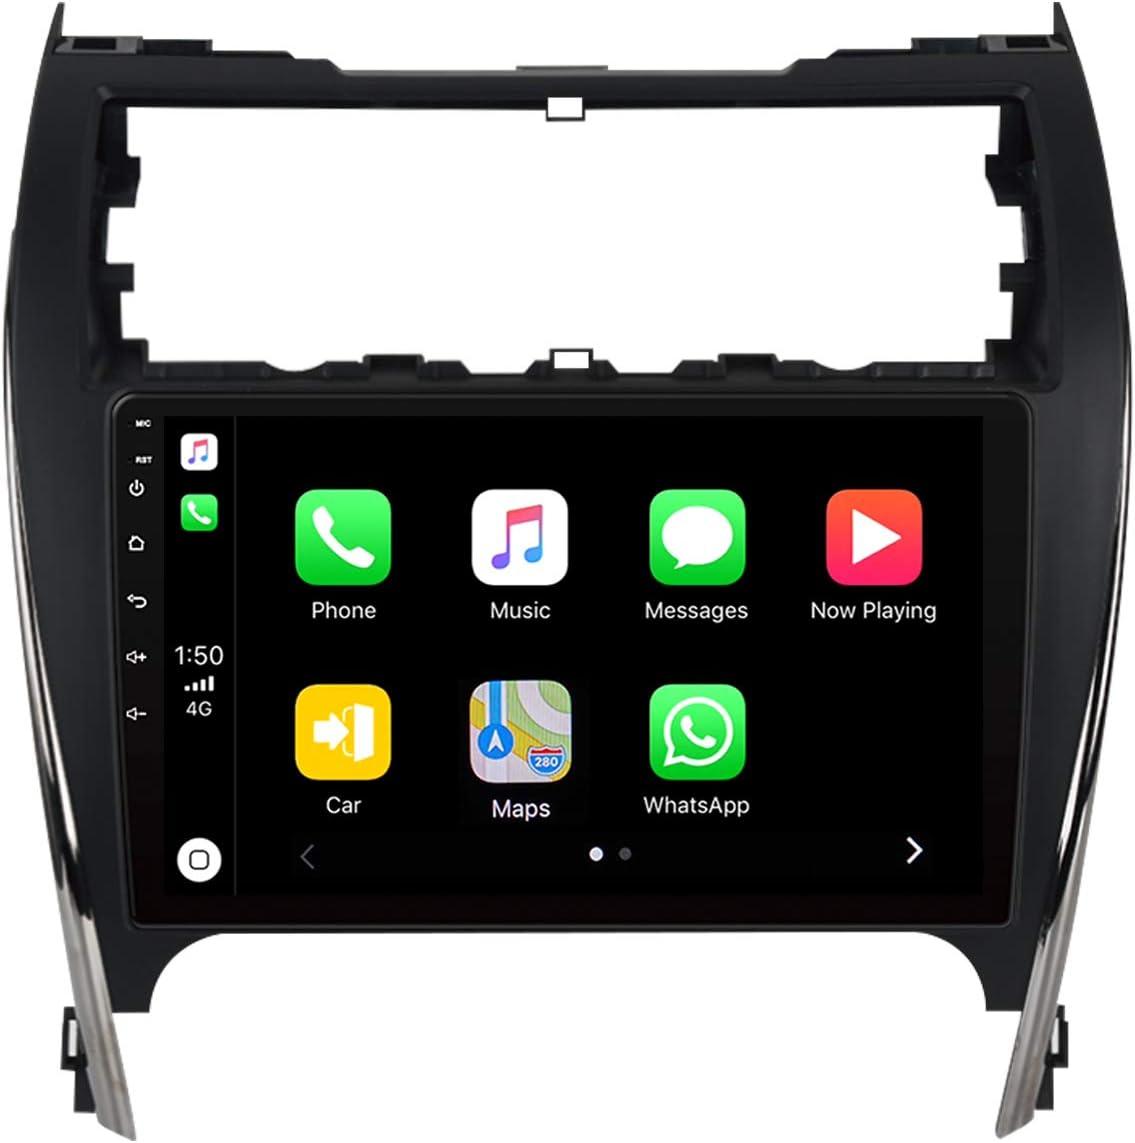 "ViaBecs 10.2"" Andorid 10.0 Car Radio with Bluetooth 5.0 for Toyota Camry 2012 2013 2014 4GB/64GB Head Unit Car Stereo with Apple Carplay Wireless 1280 x 720 GPS Navigation WiFi FM/AM"